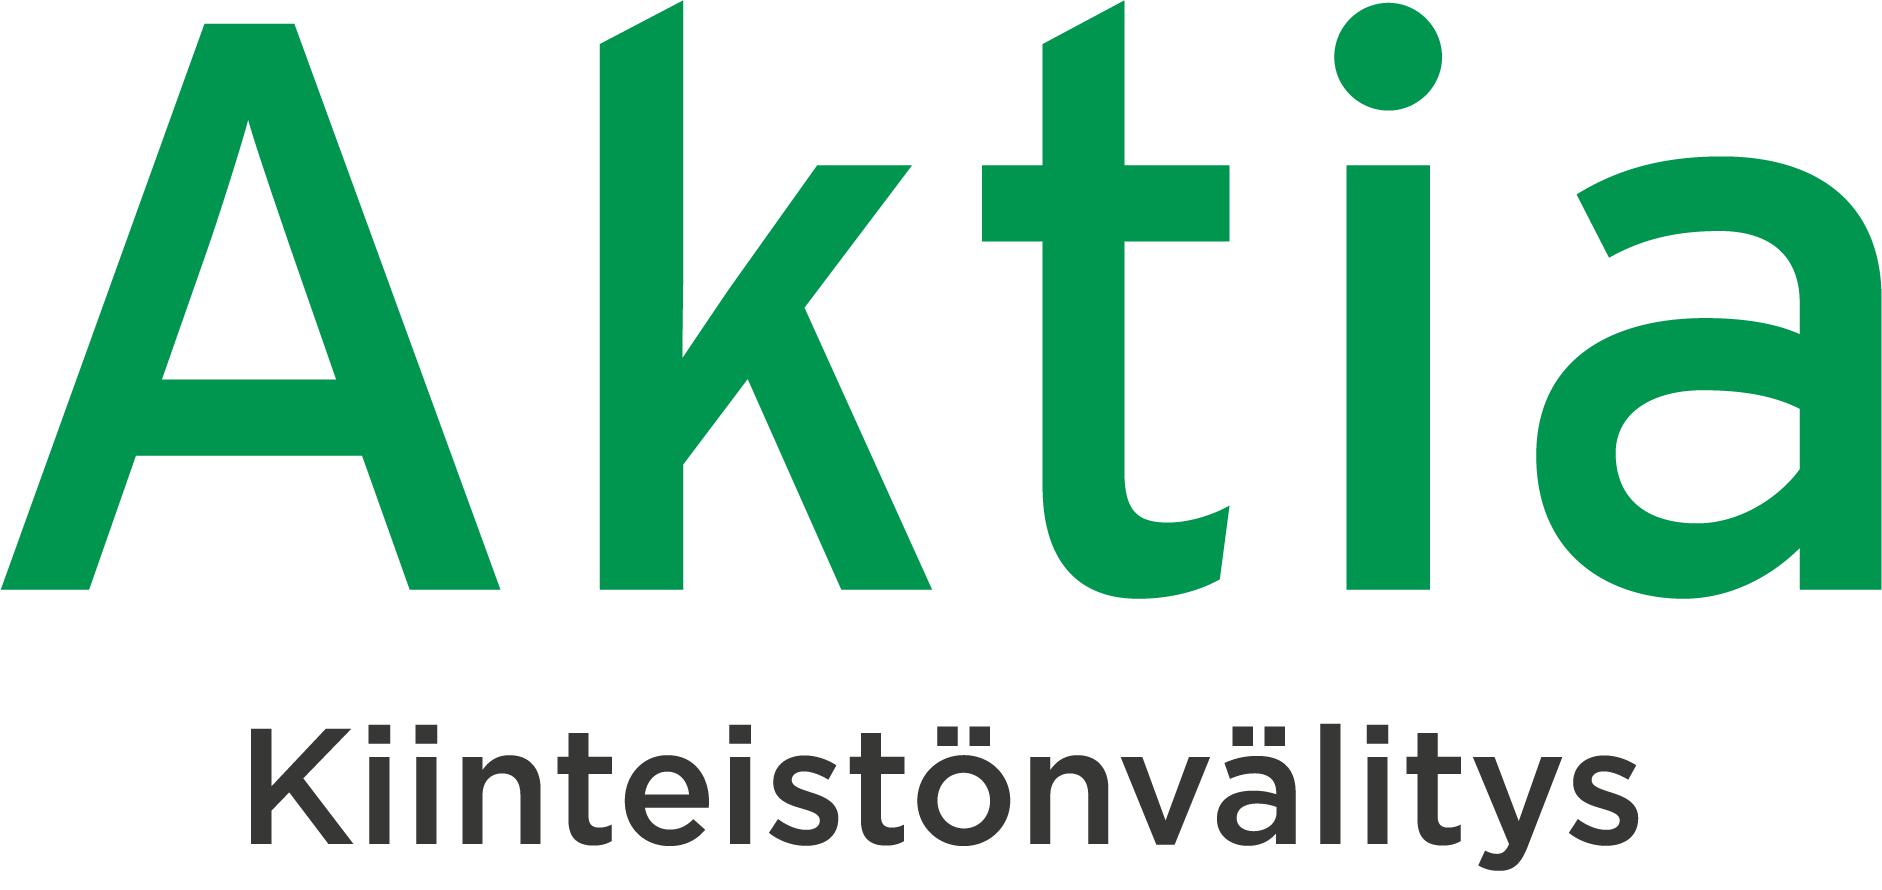 Aktia Kiinteistönvälitys Oy, Porvoo, Aktia Fastighetsförmedl